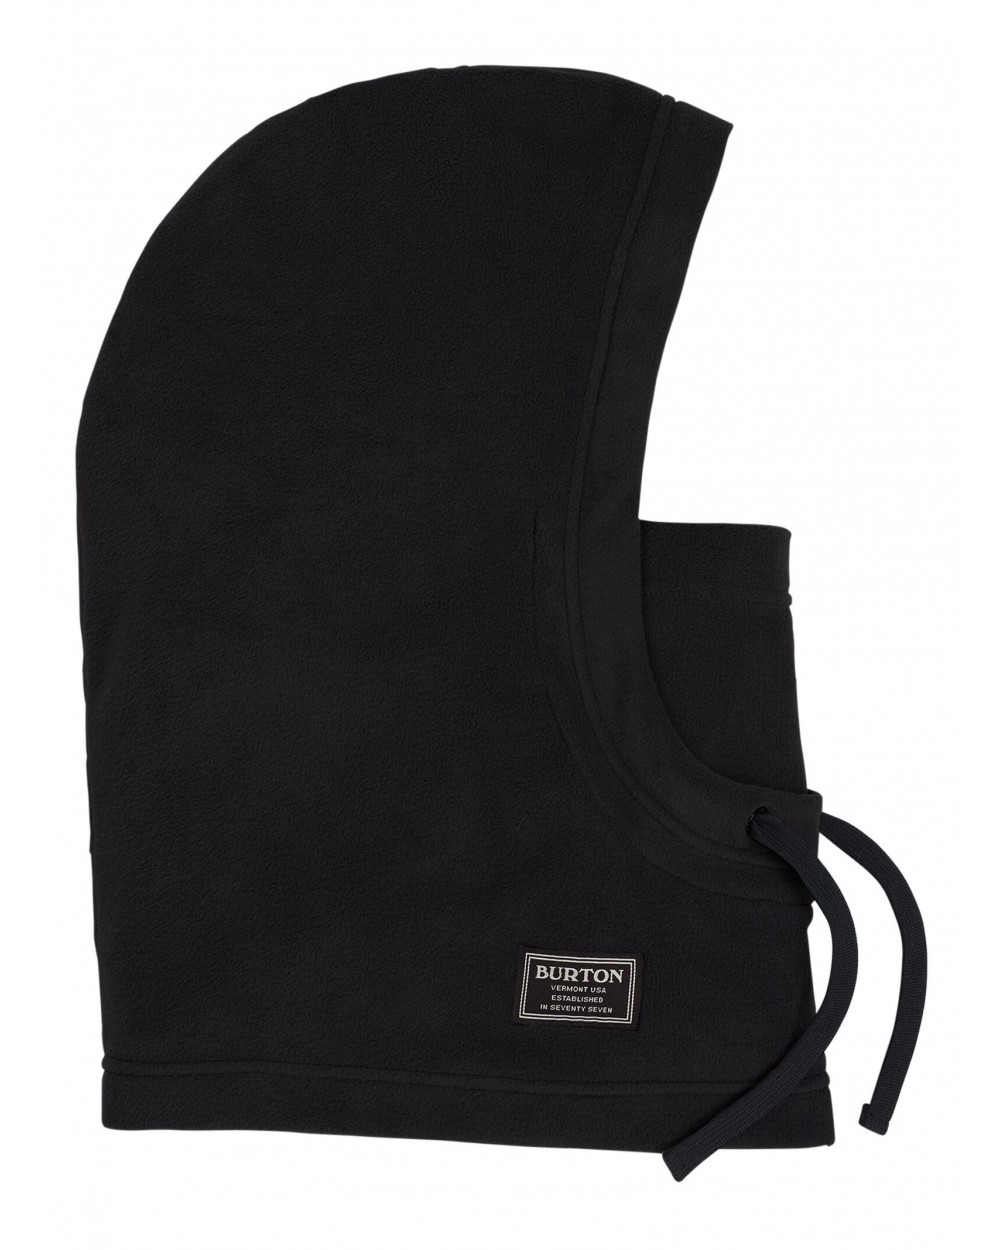 Burton Burke Hood (Helmet Size) - True Black